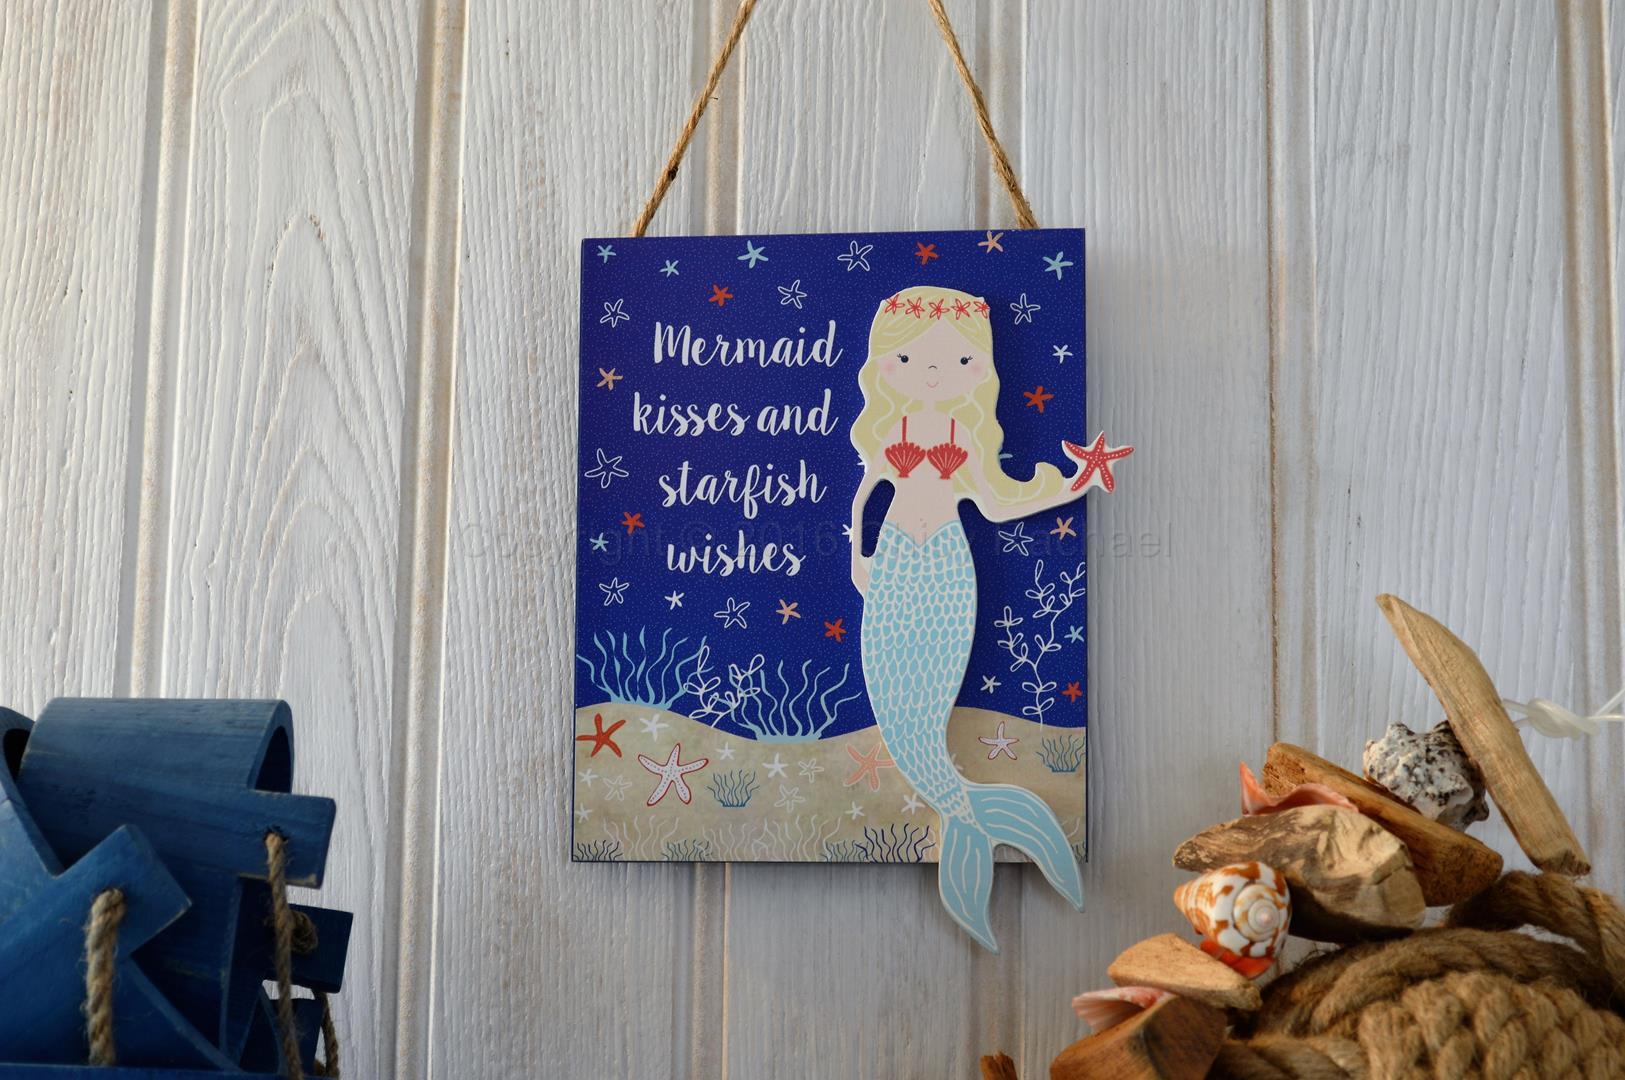 Mermaid Kisses And Starfish Wishes Sign